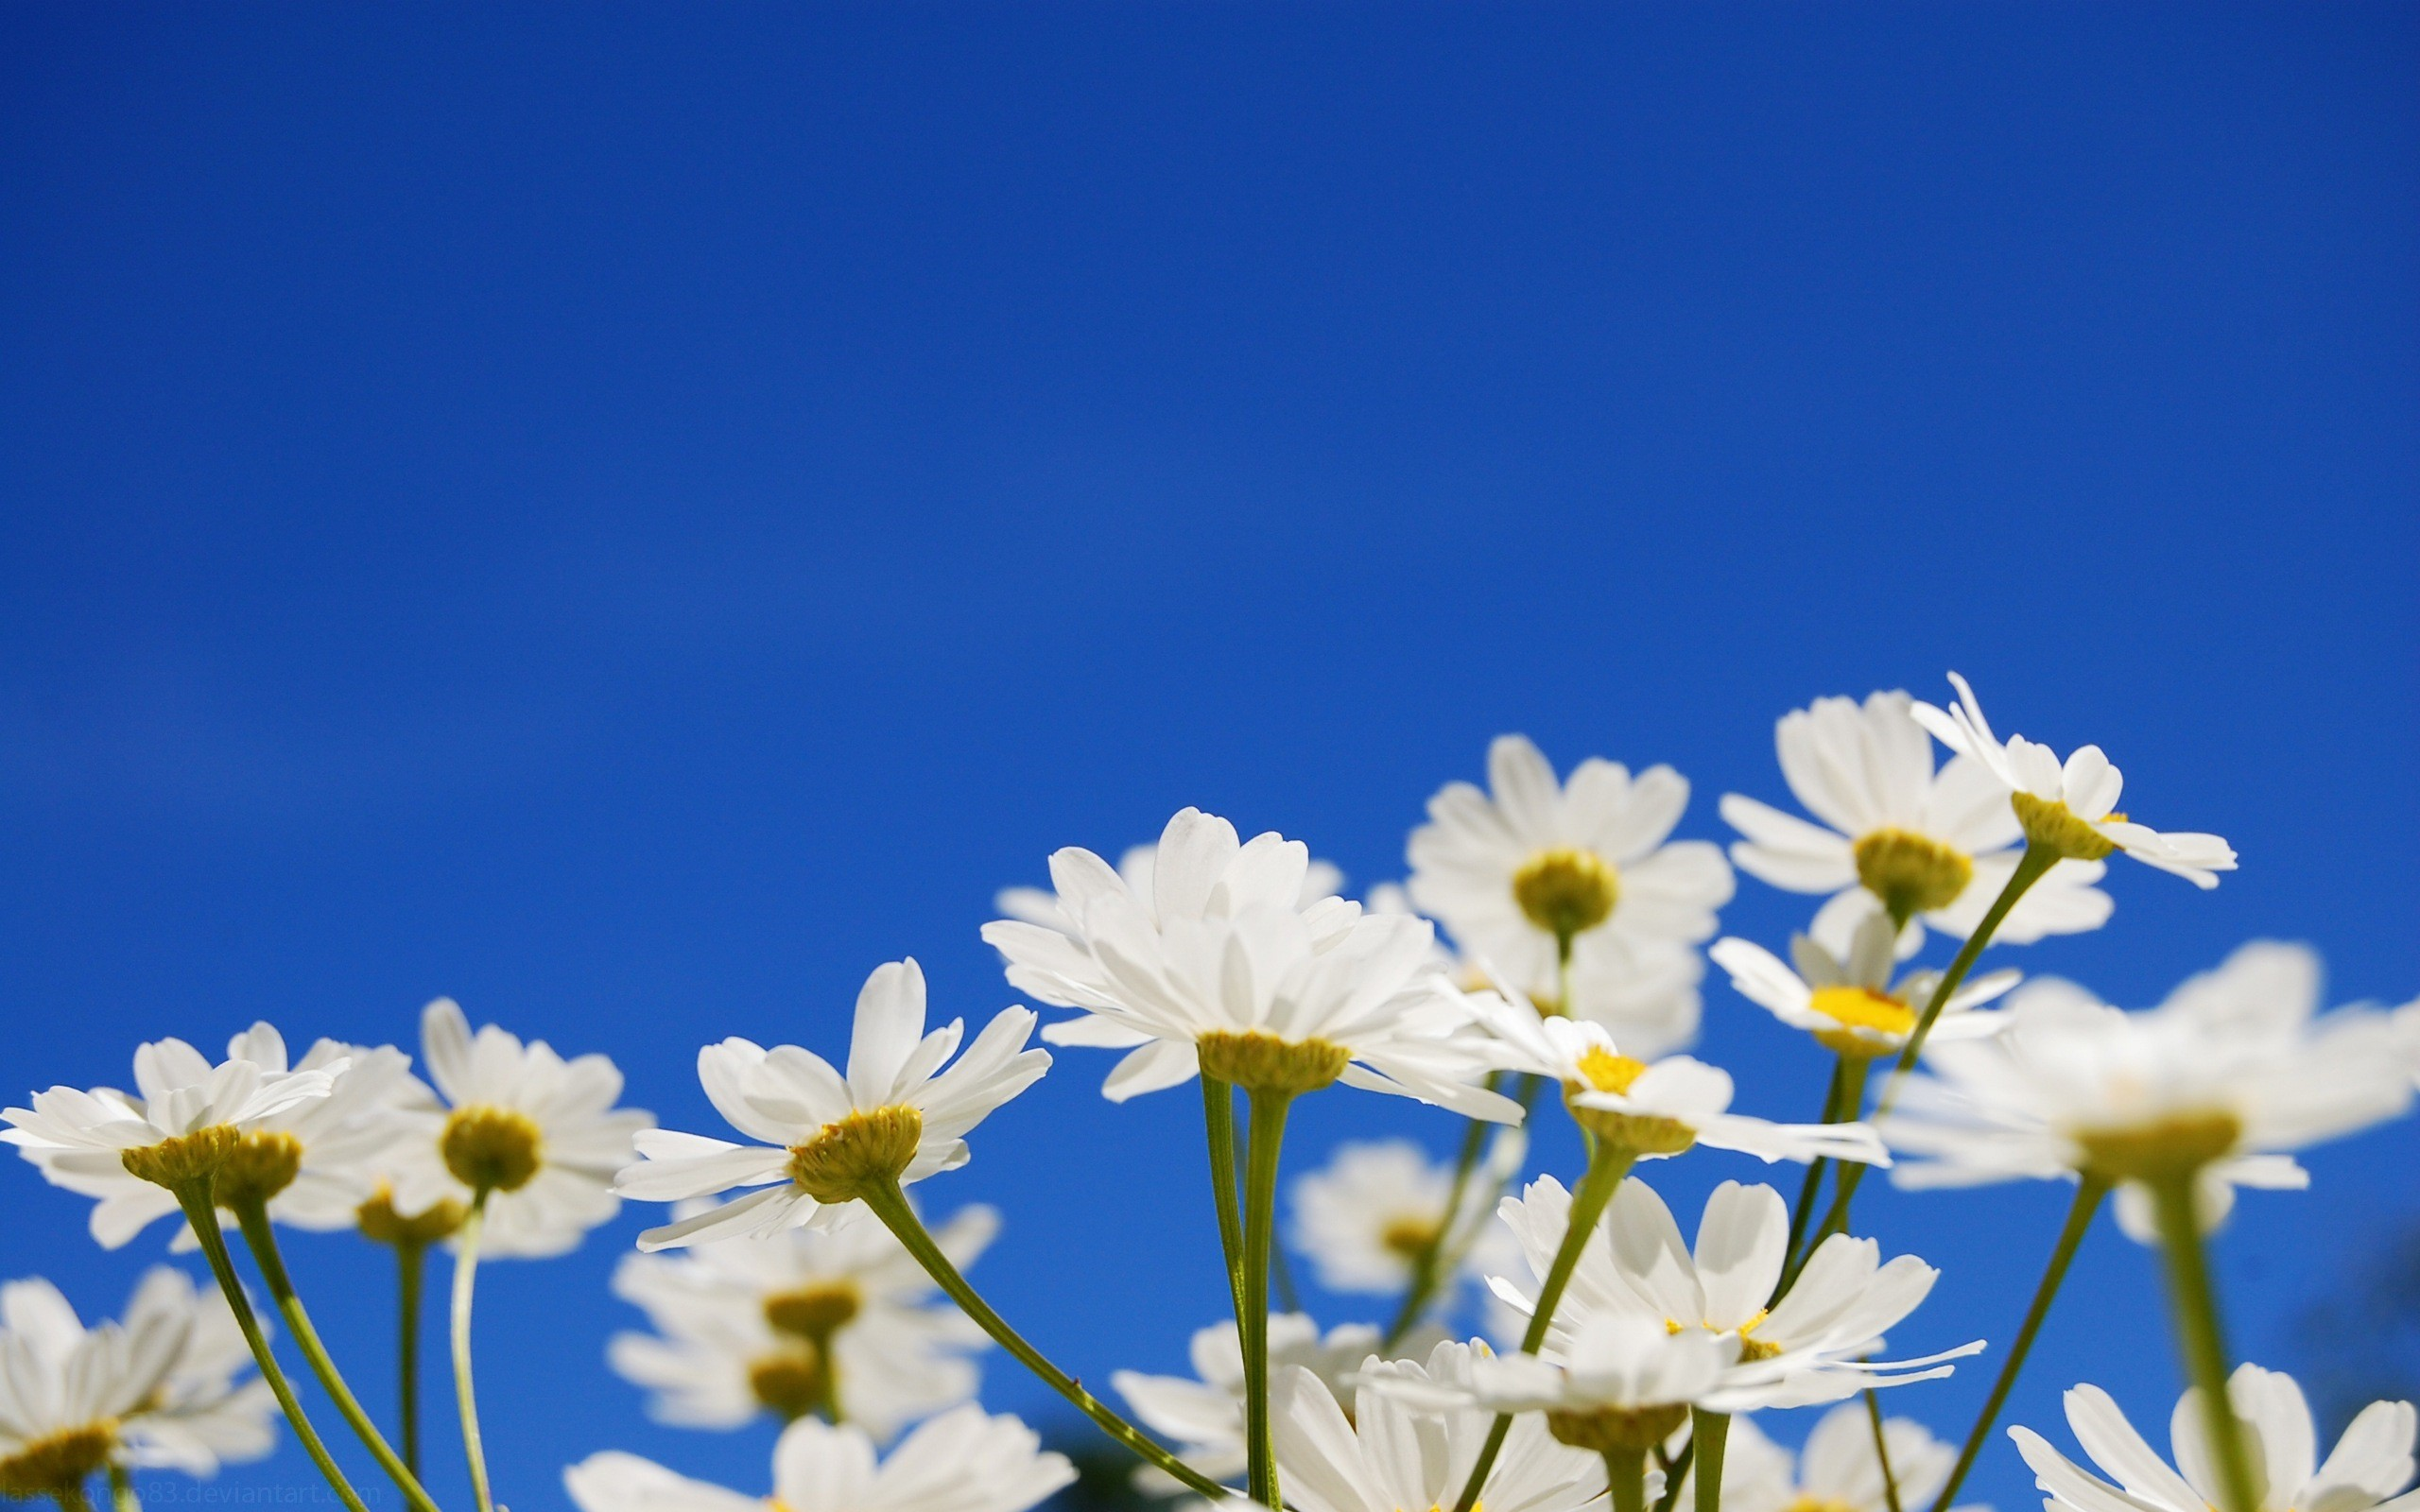 ромашки поле цветы chamomile field flowers бесплатно